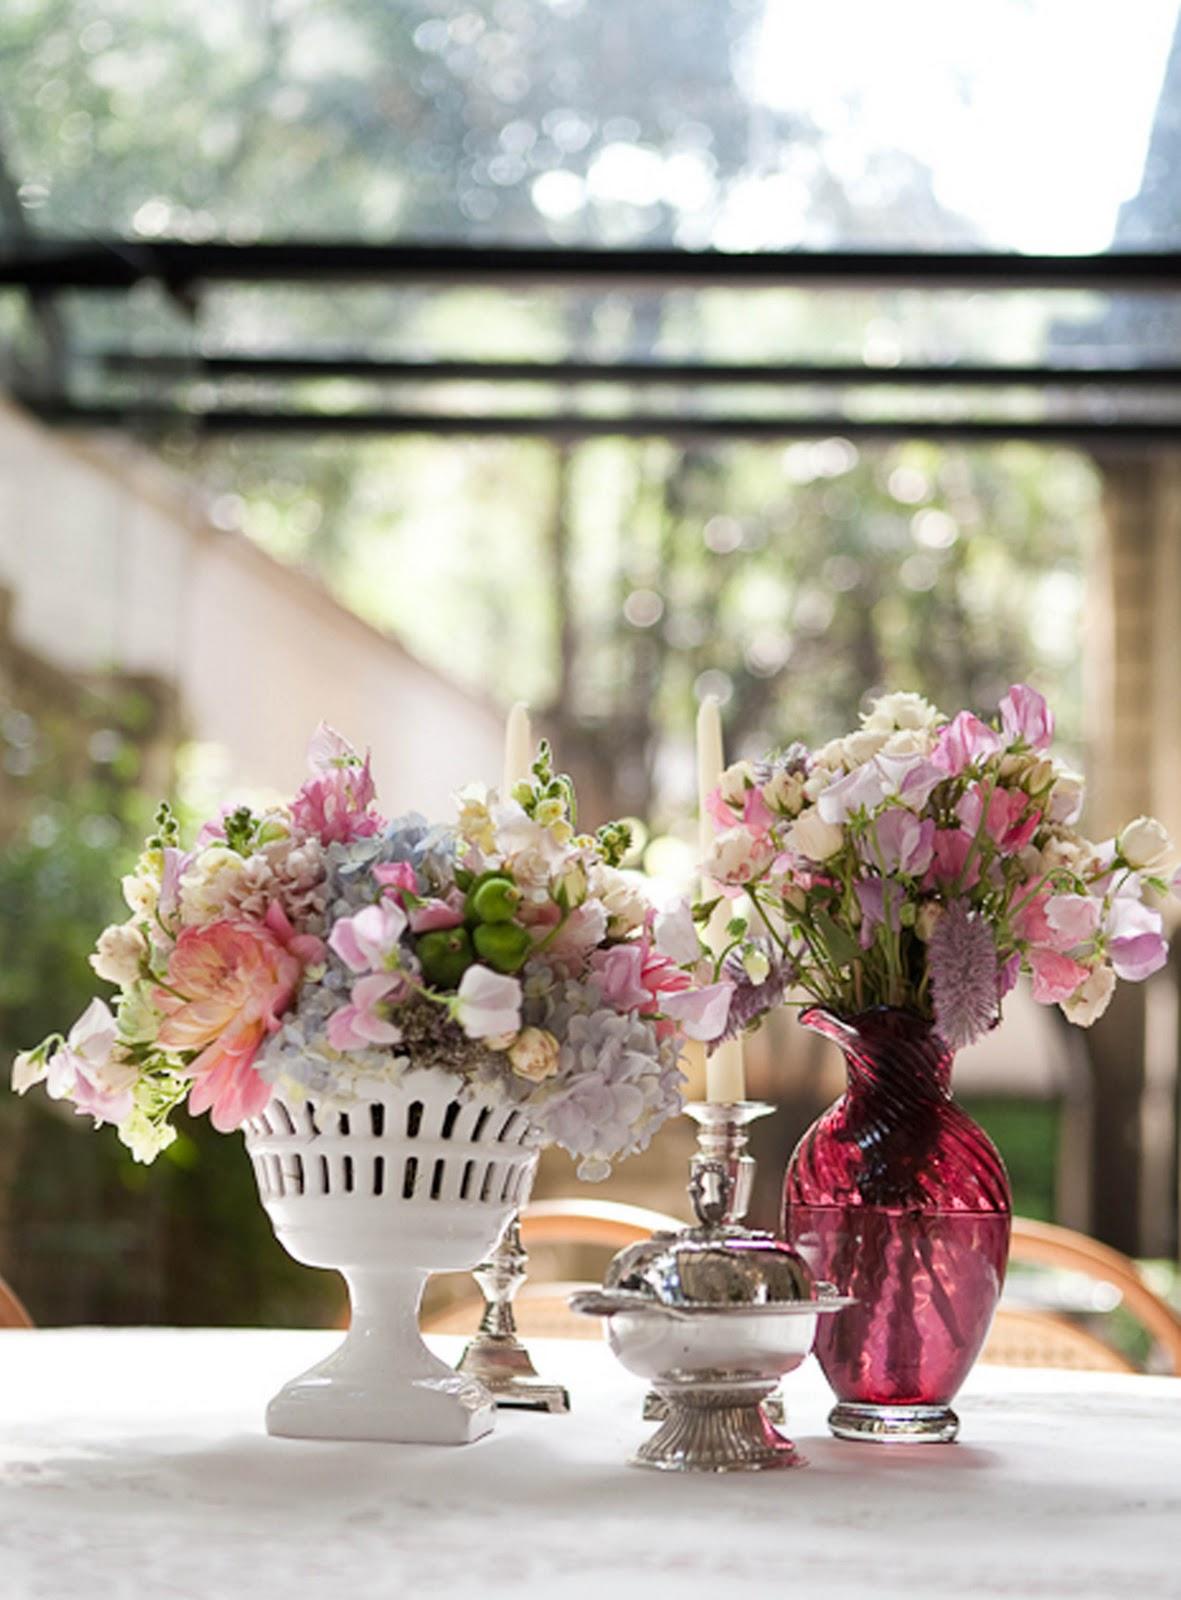 decoracao de interiores estilo romântico:Luxo Decor: Decoração Vintage